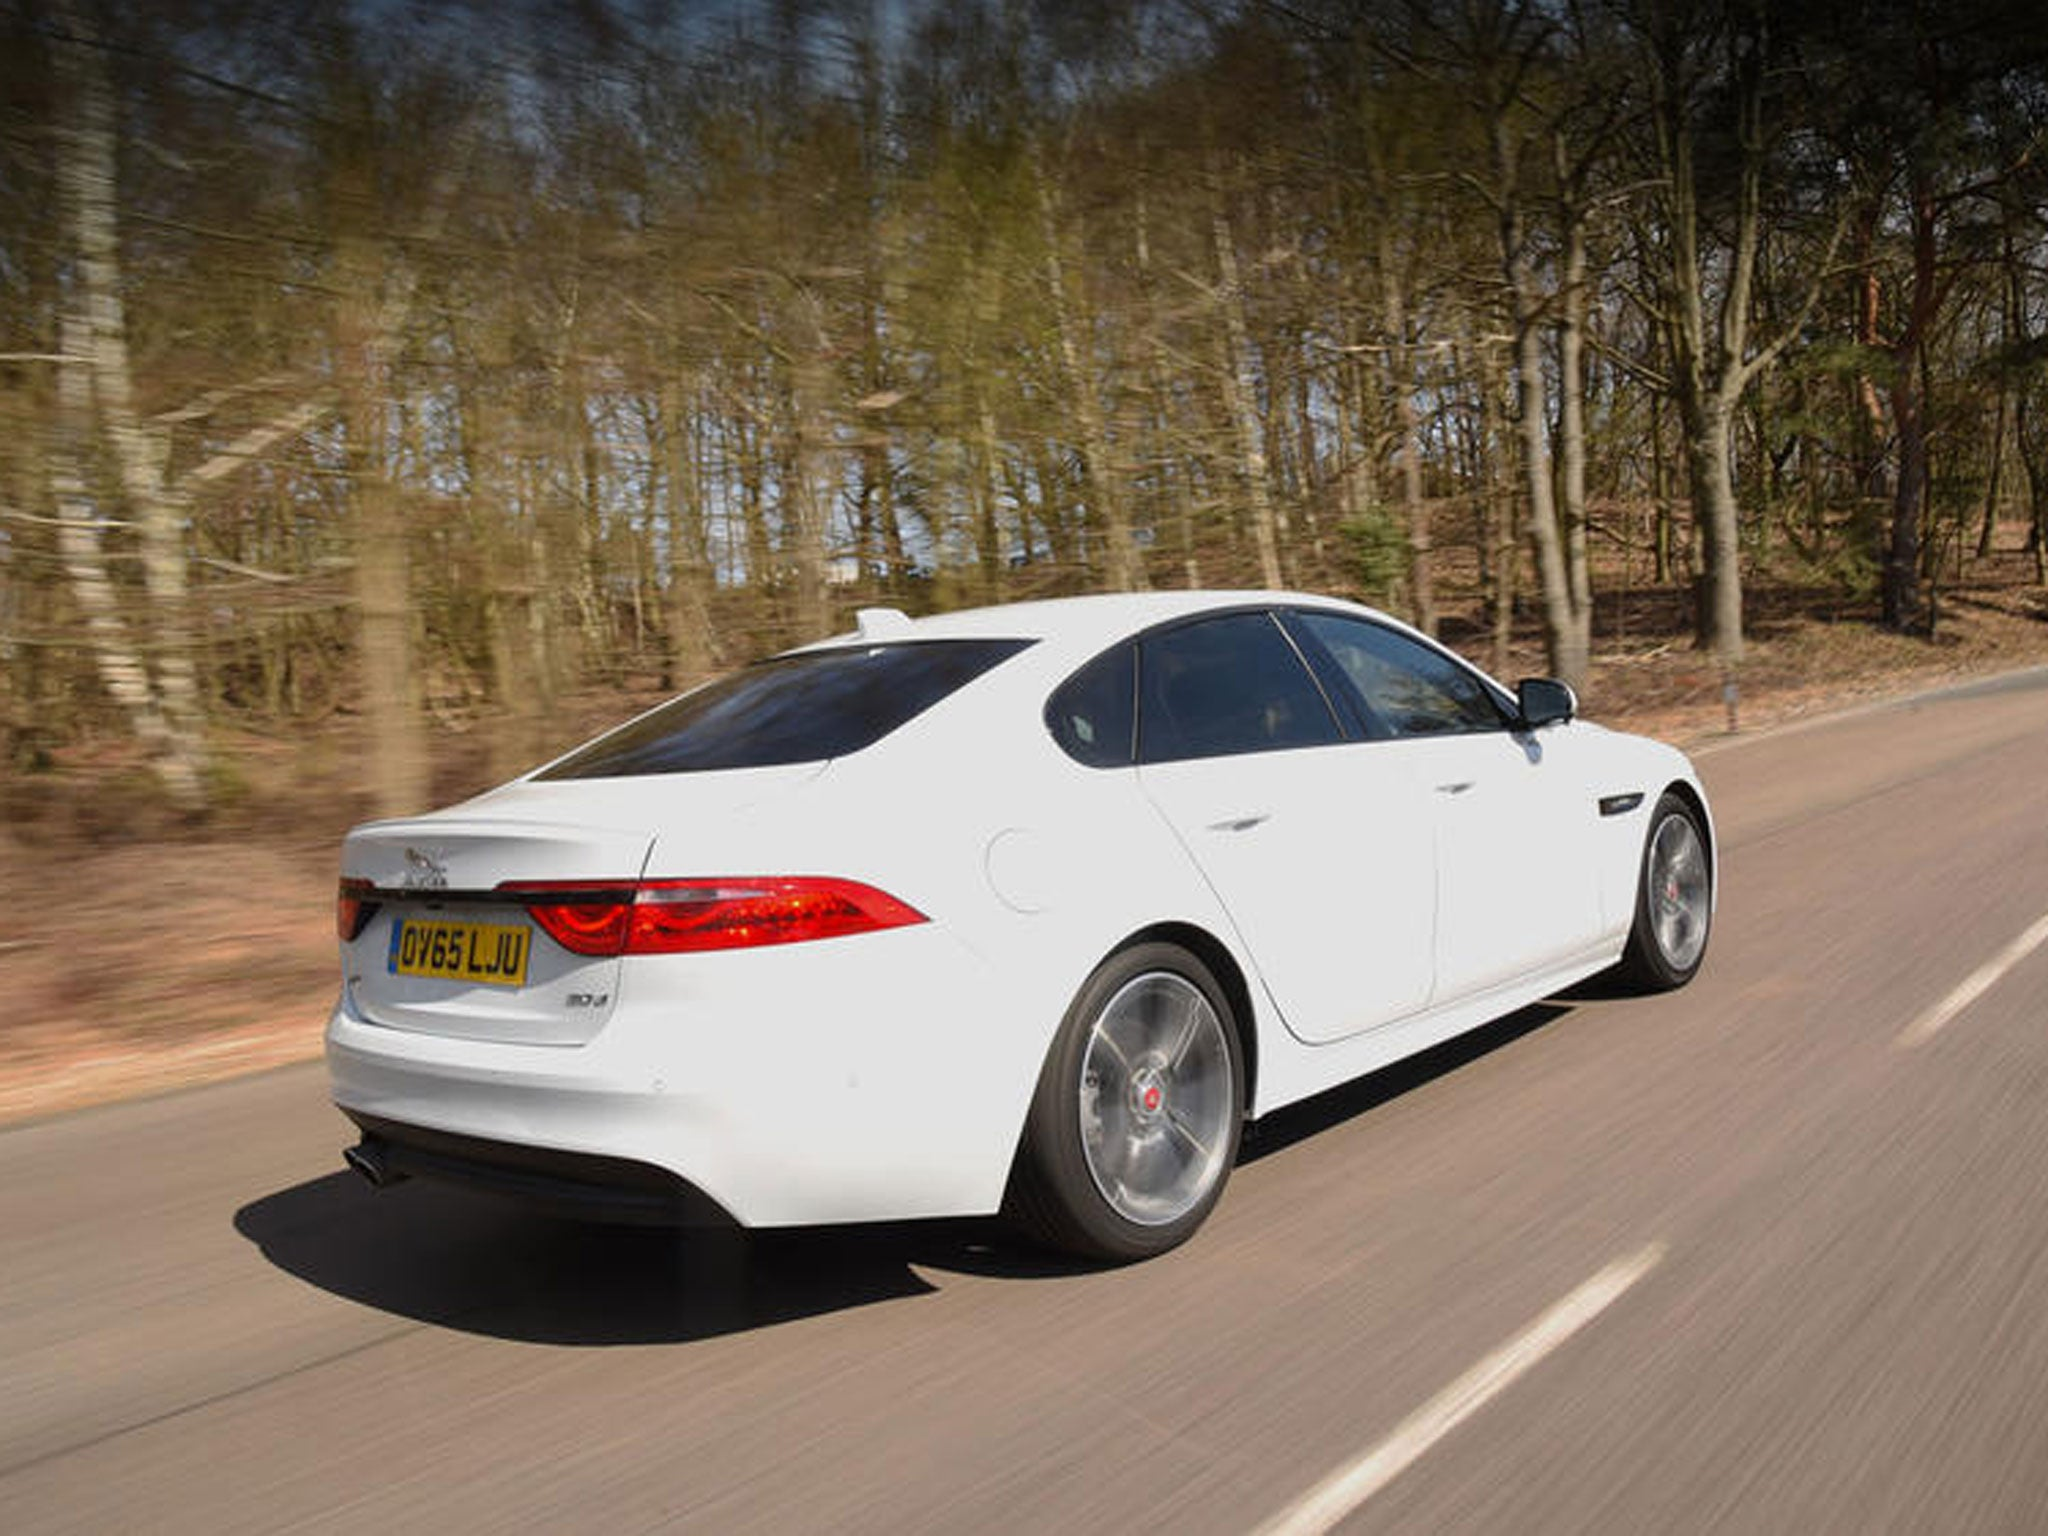 BMW 5 Series vs Jaguar XF vs Mercedes-Benz E-Class triple test: A